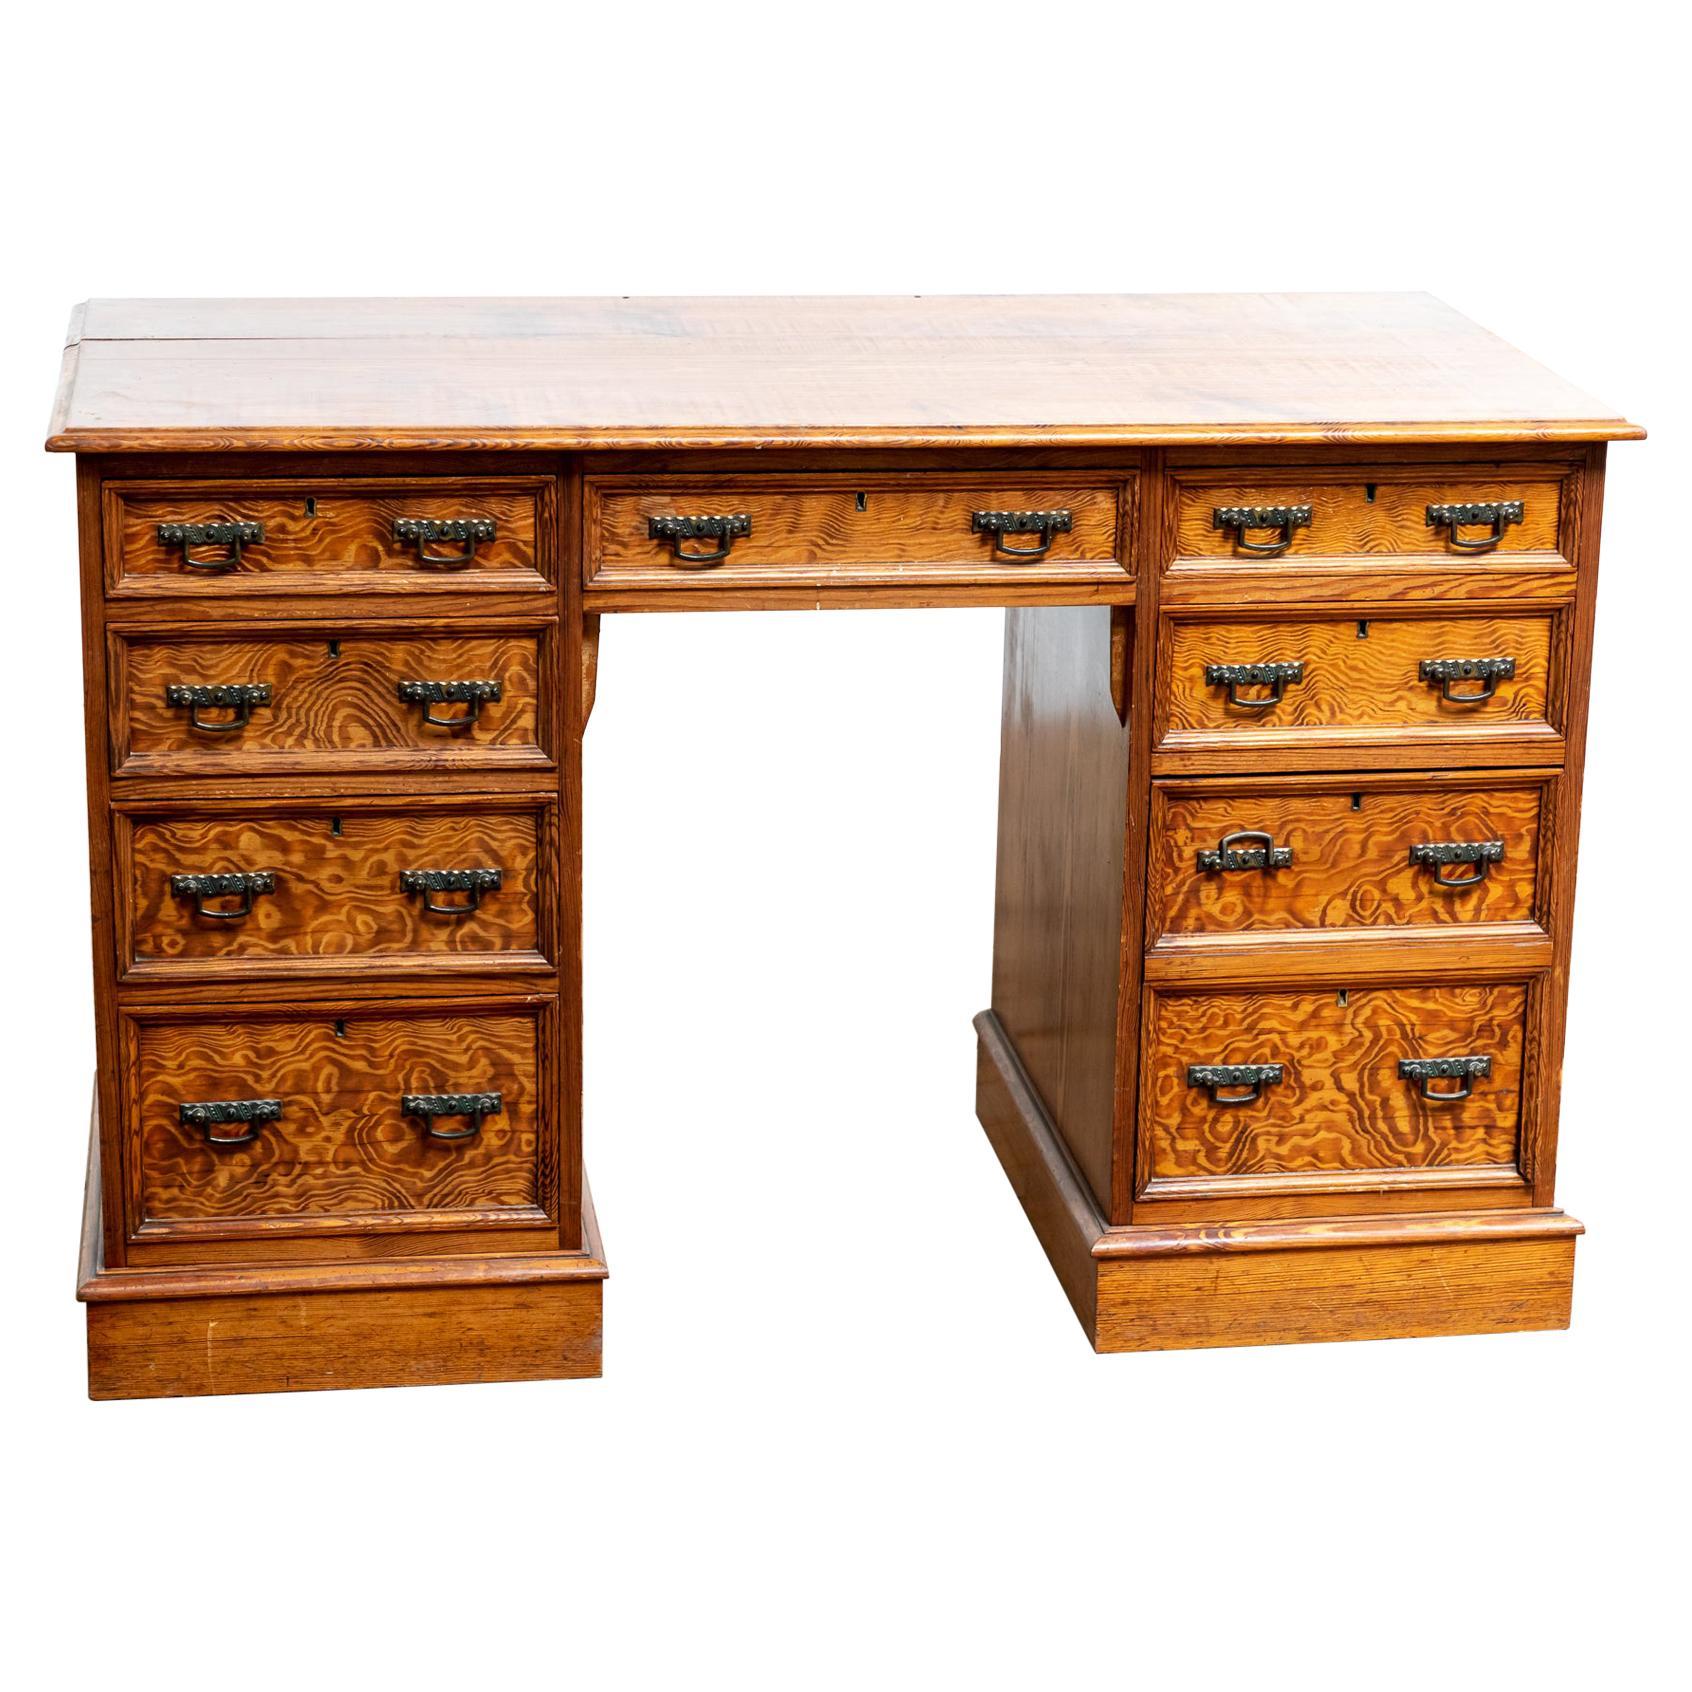 Antique English Aesthetic Movement 19th Century Oregon Pine Desk